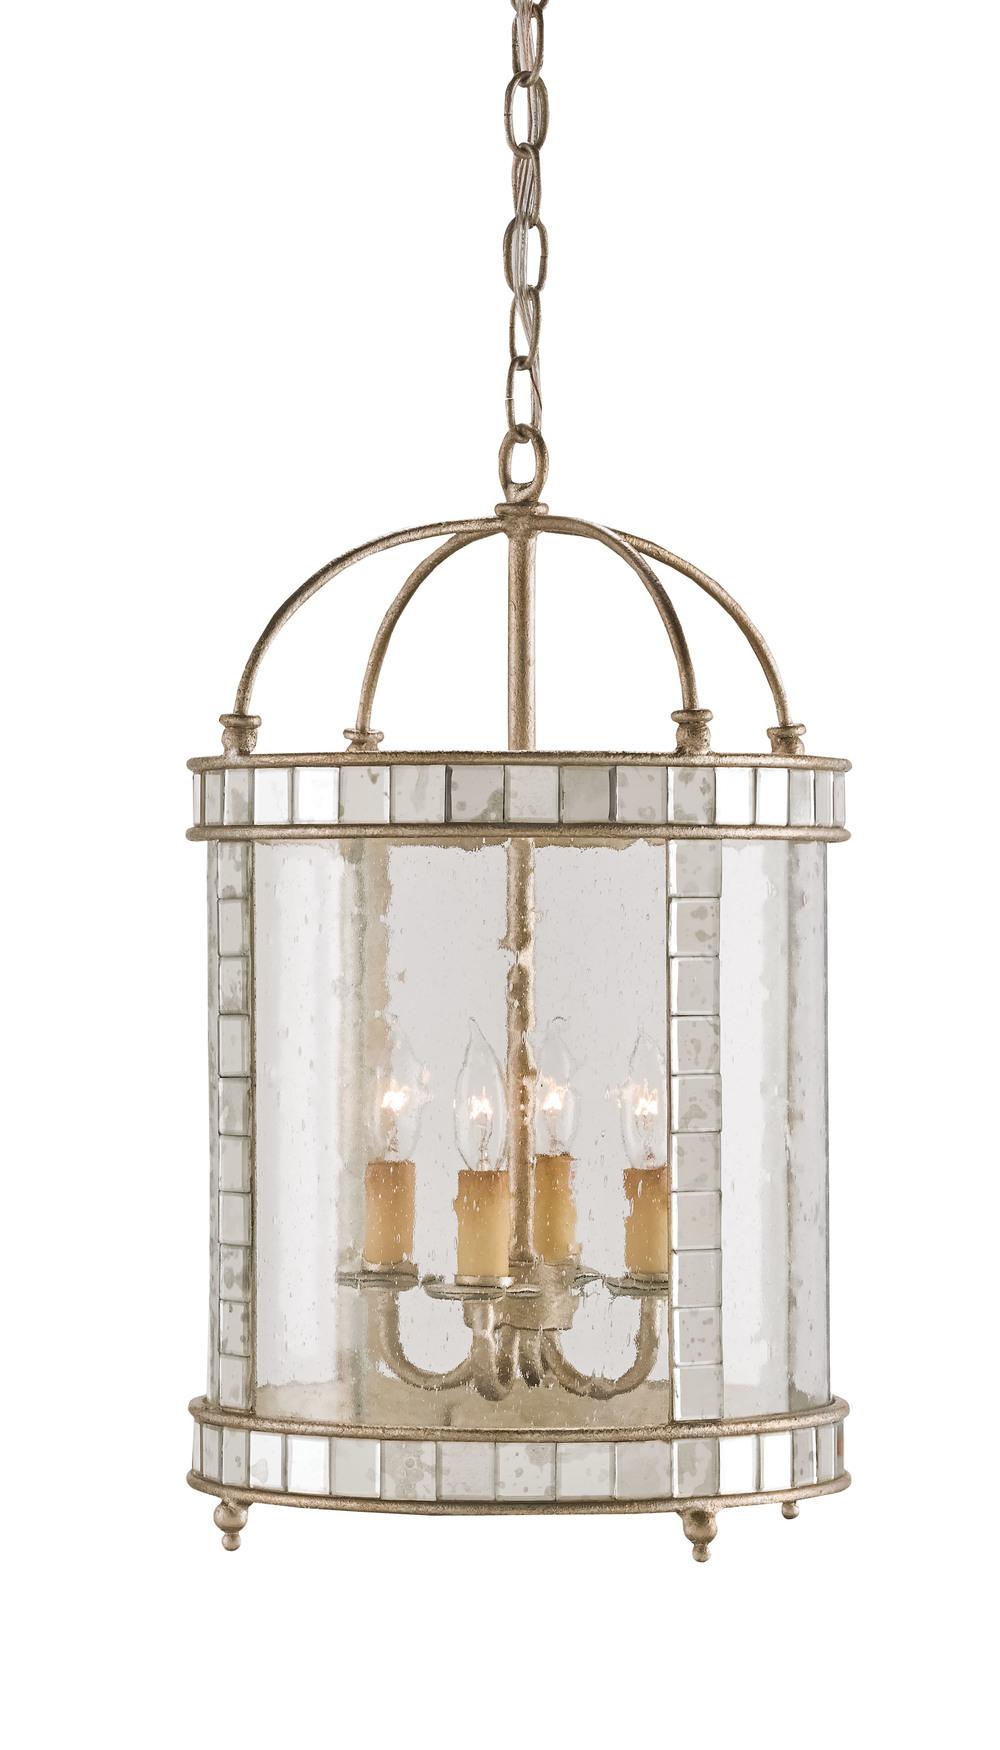 Currey & Company - Corsica Large Lantern